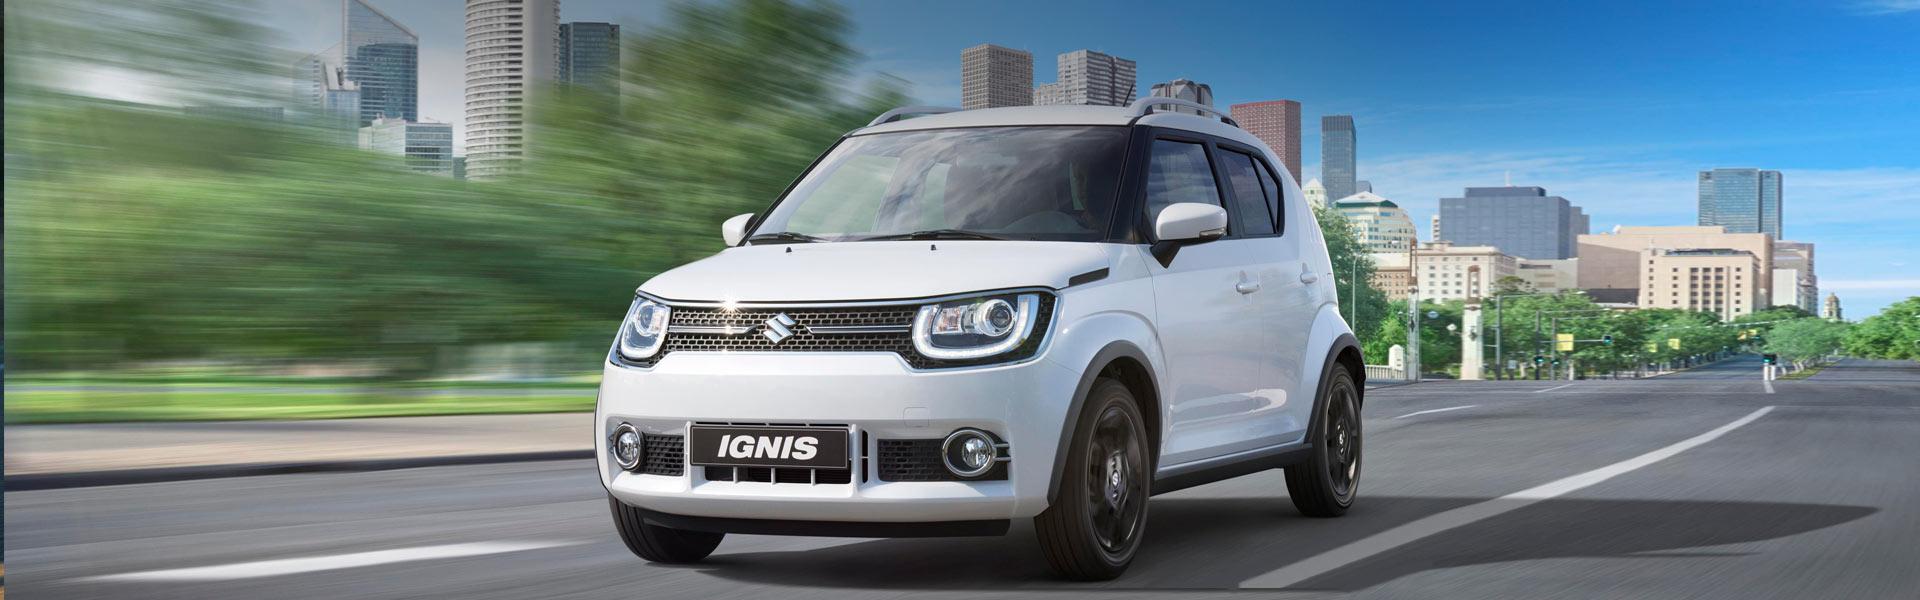 Сервис Suzuki Ignis